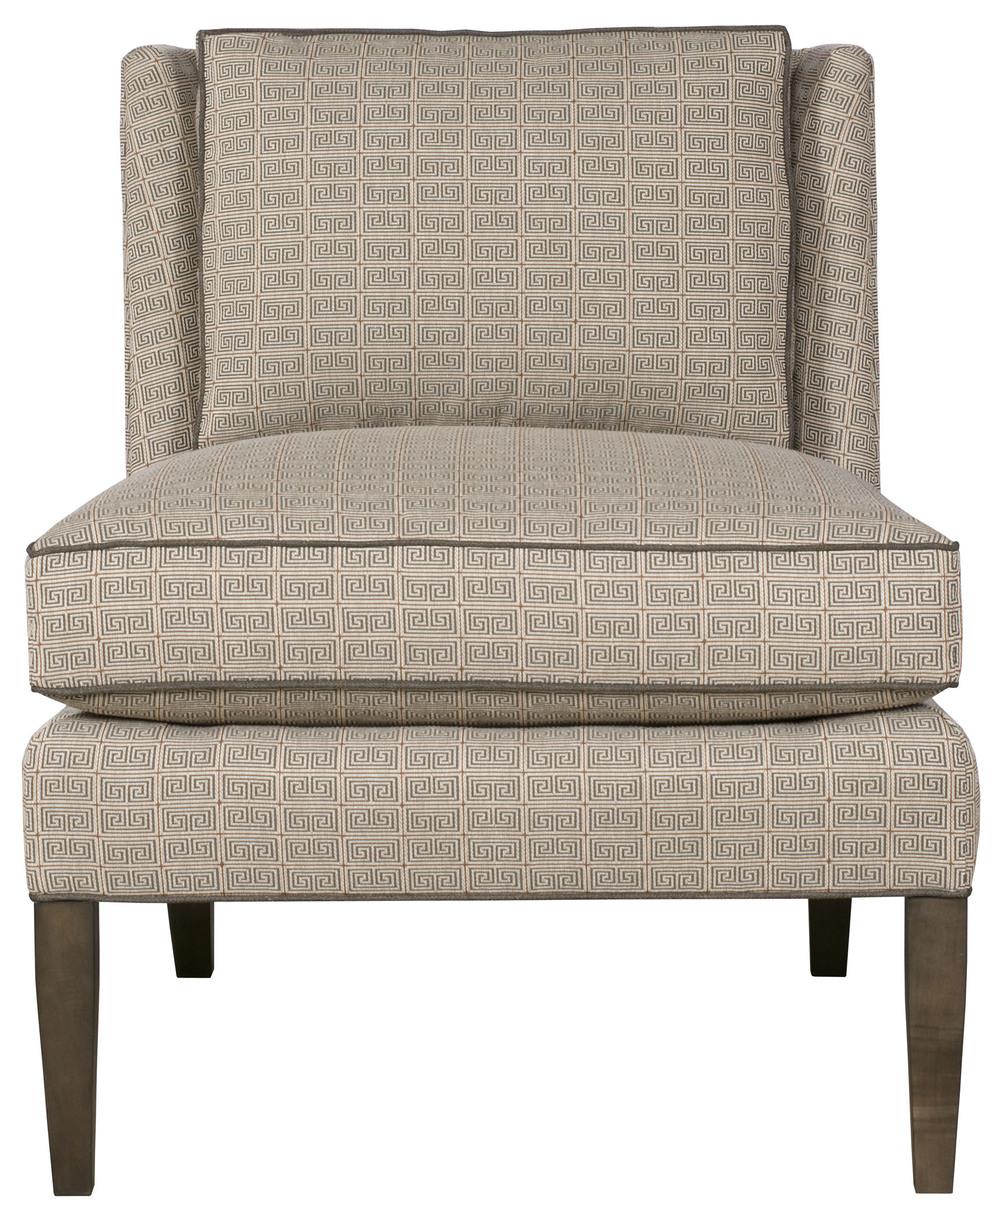 Vanguard Furniture - Jenkins Chair